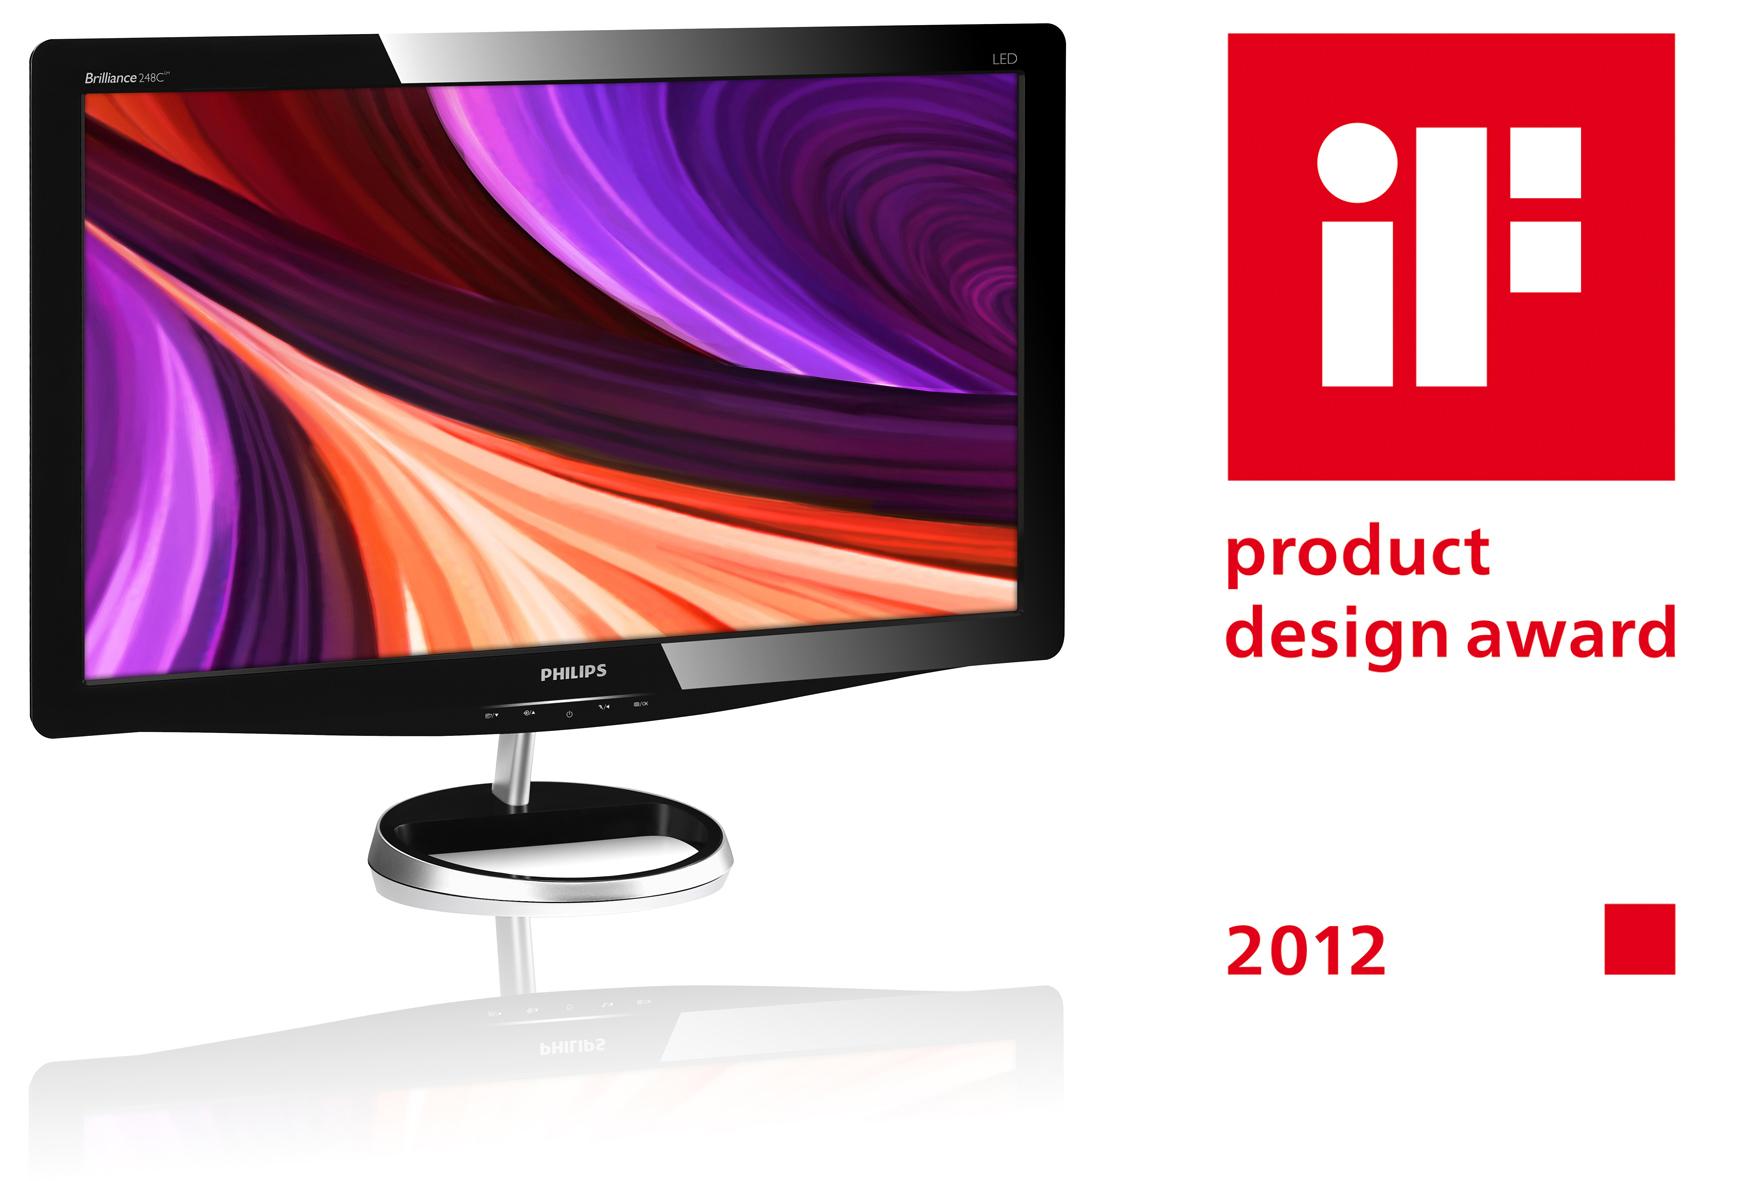 1_philips_moda_monitor_if_design_nagrada_2012_2.jpg